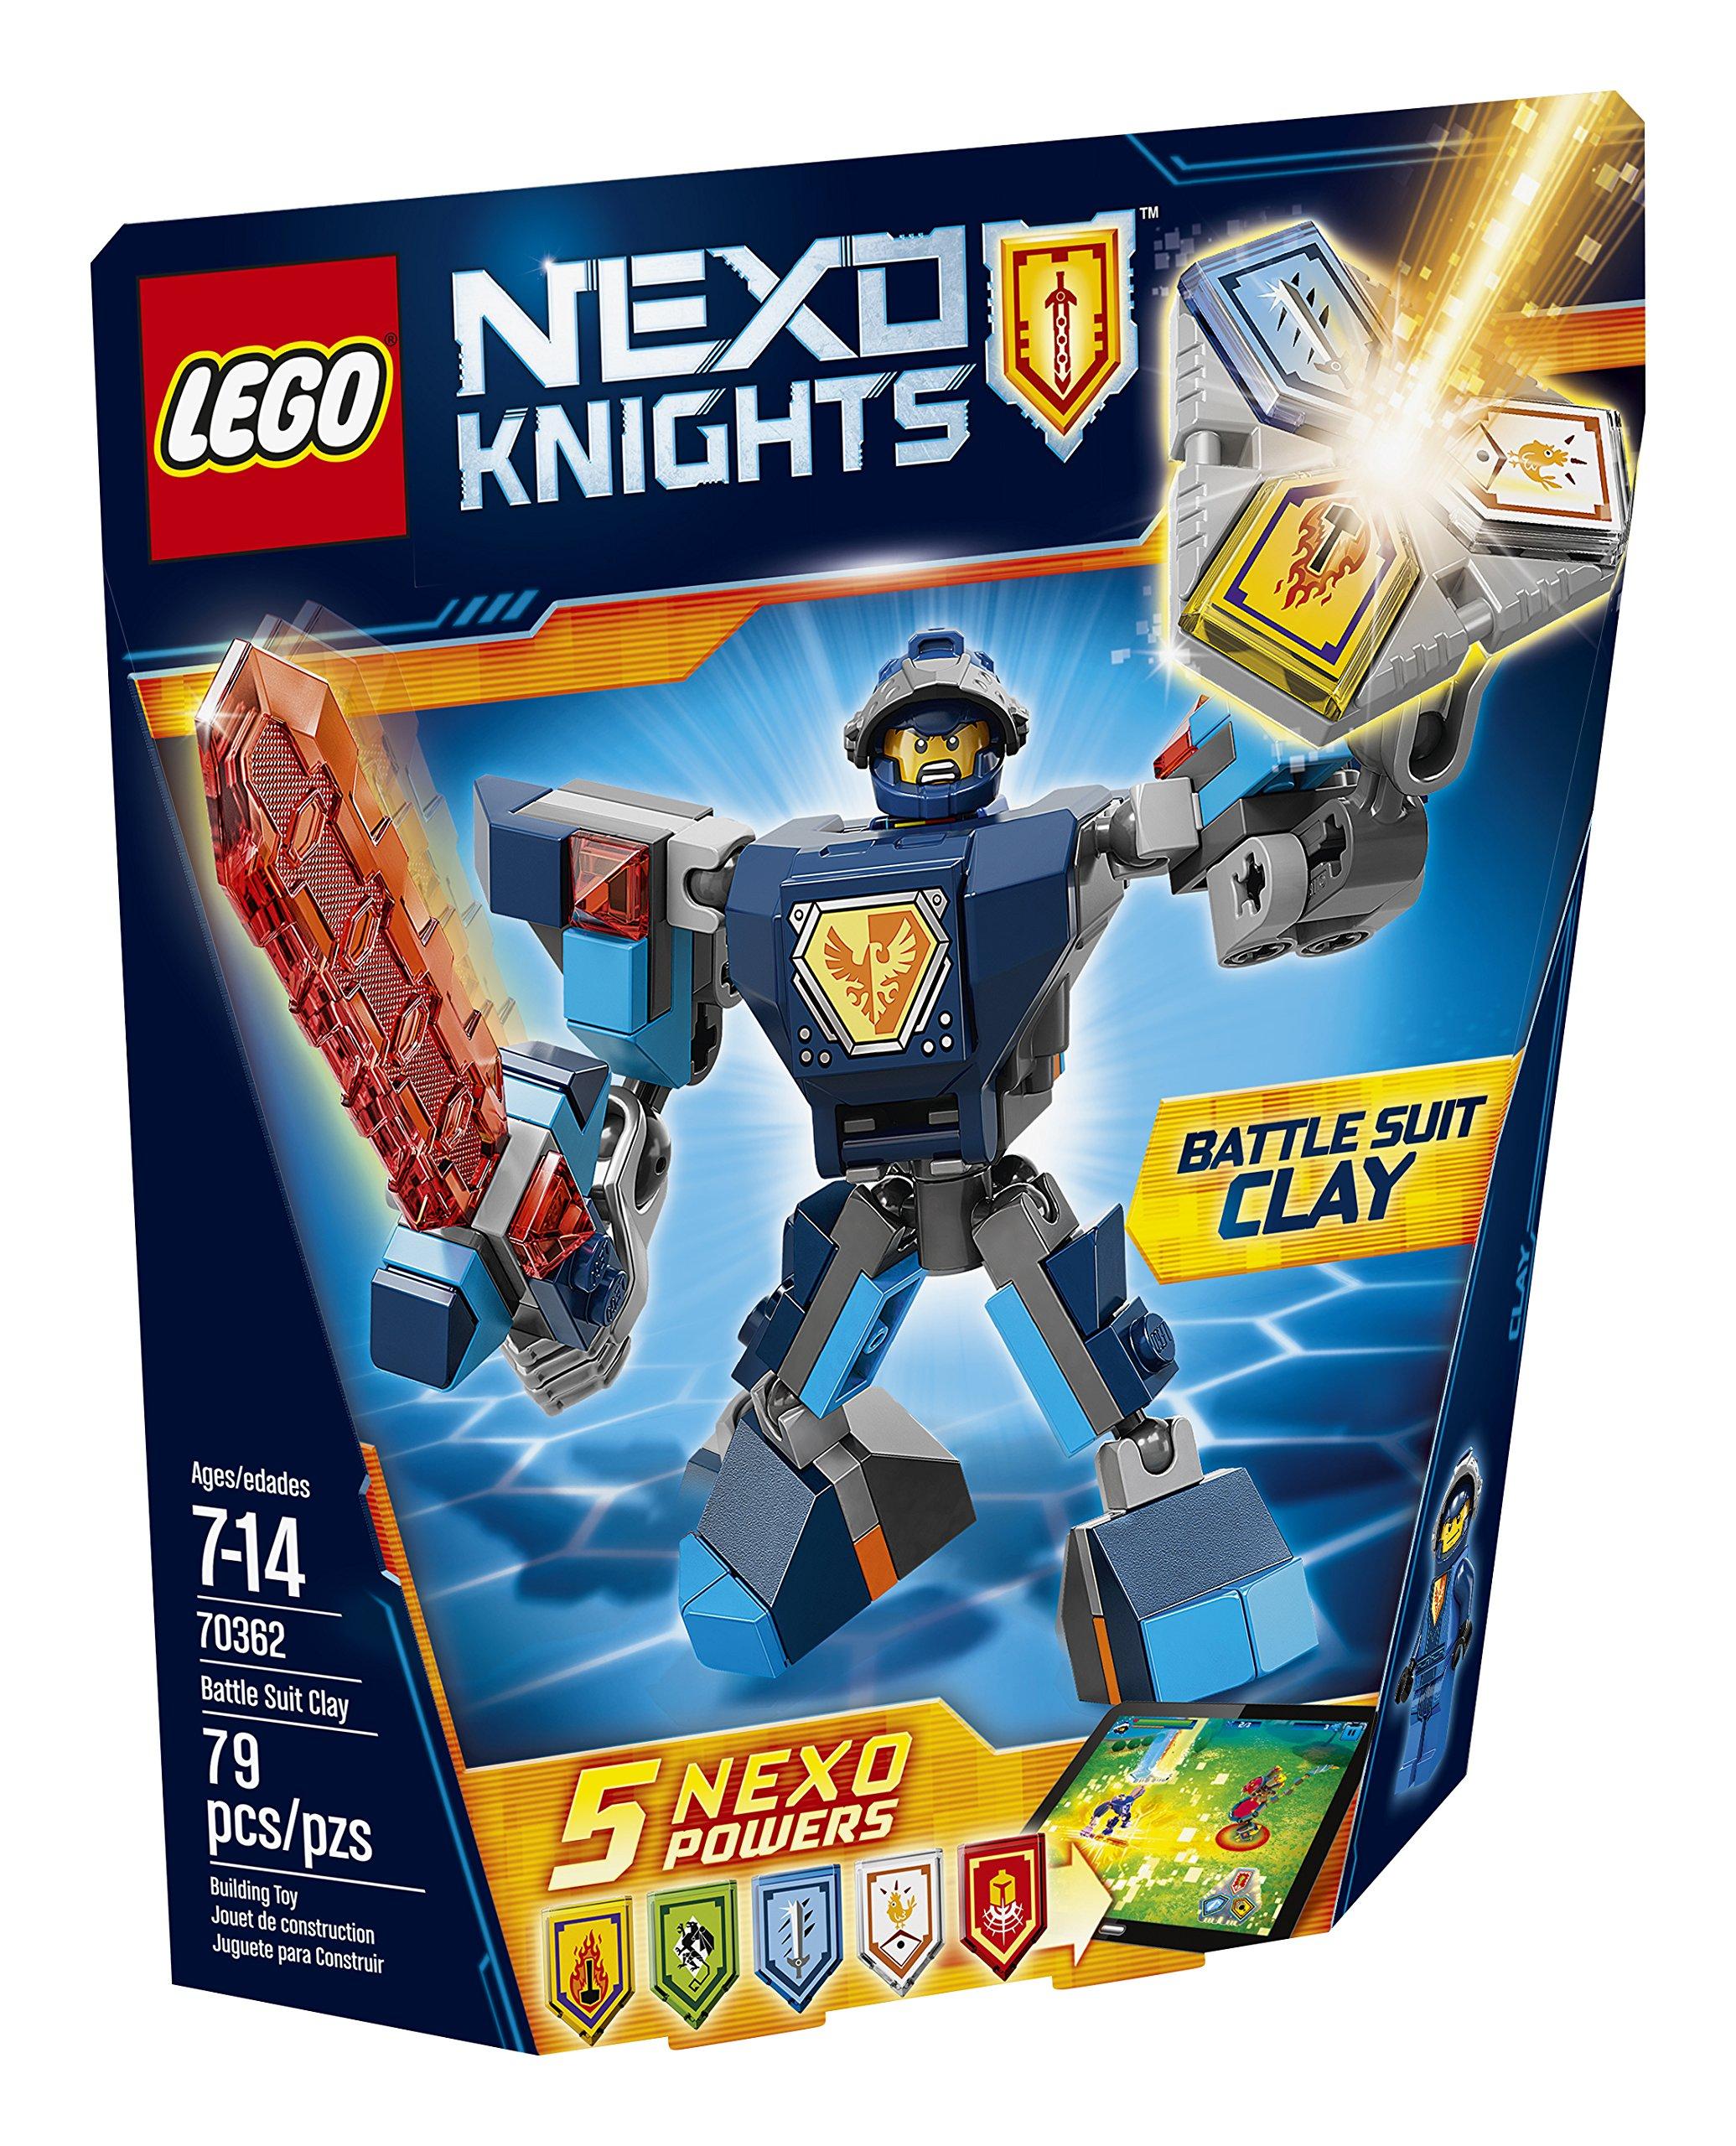 Amazon.com: LEGO Nexo Knights Battle Suit Clay 70362 Building Kit ...